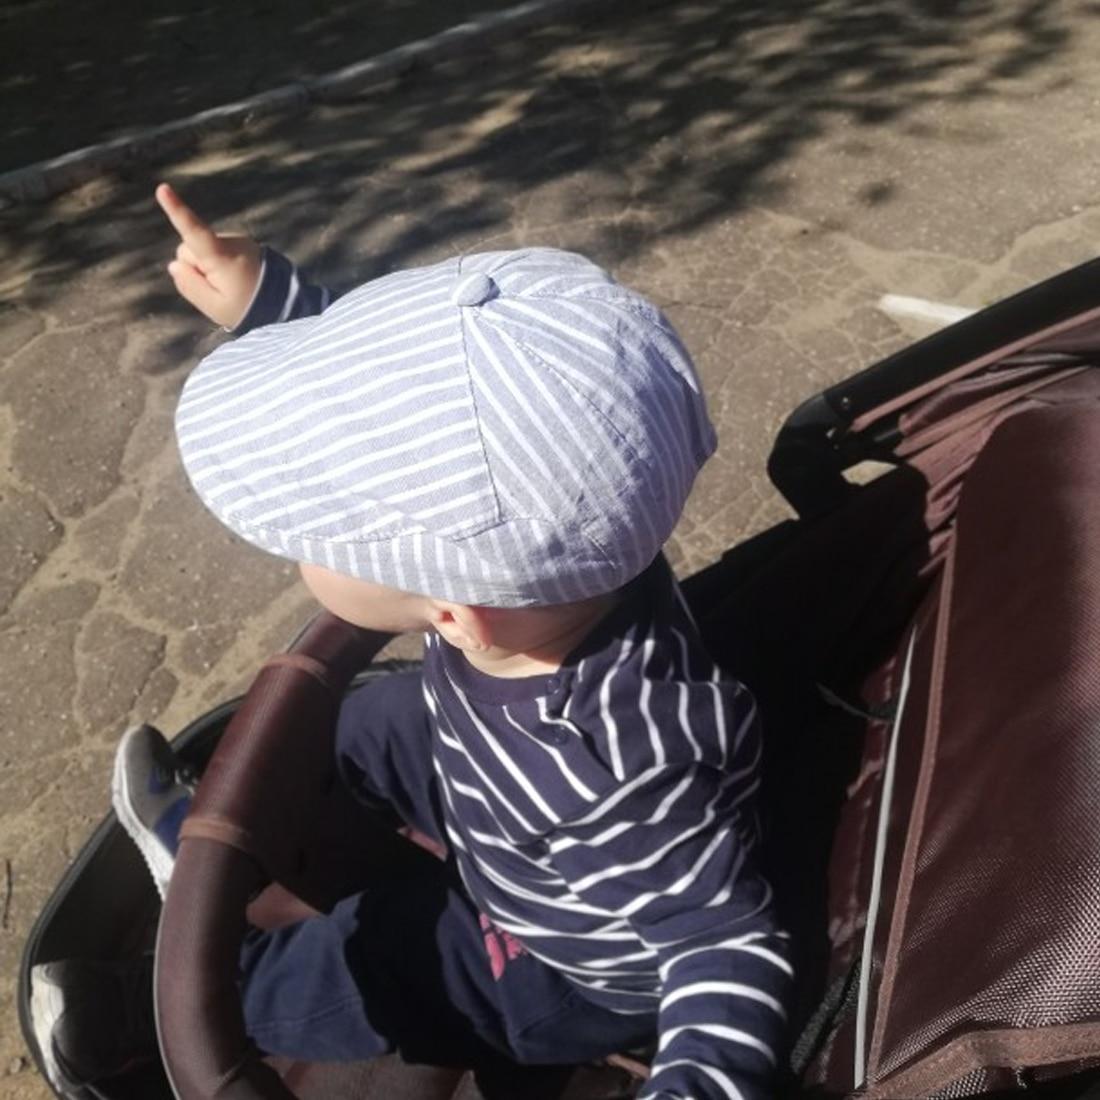 Children Stripe Classic Style Kids Fashion Cap Toddler Summer Berets Hat Boy Caps for Child Girl Berets Kids Hats in Hats Caps from Mother Kids